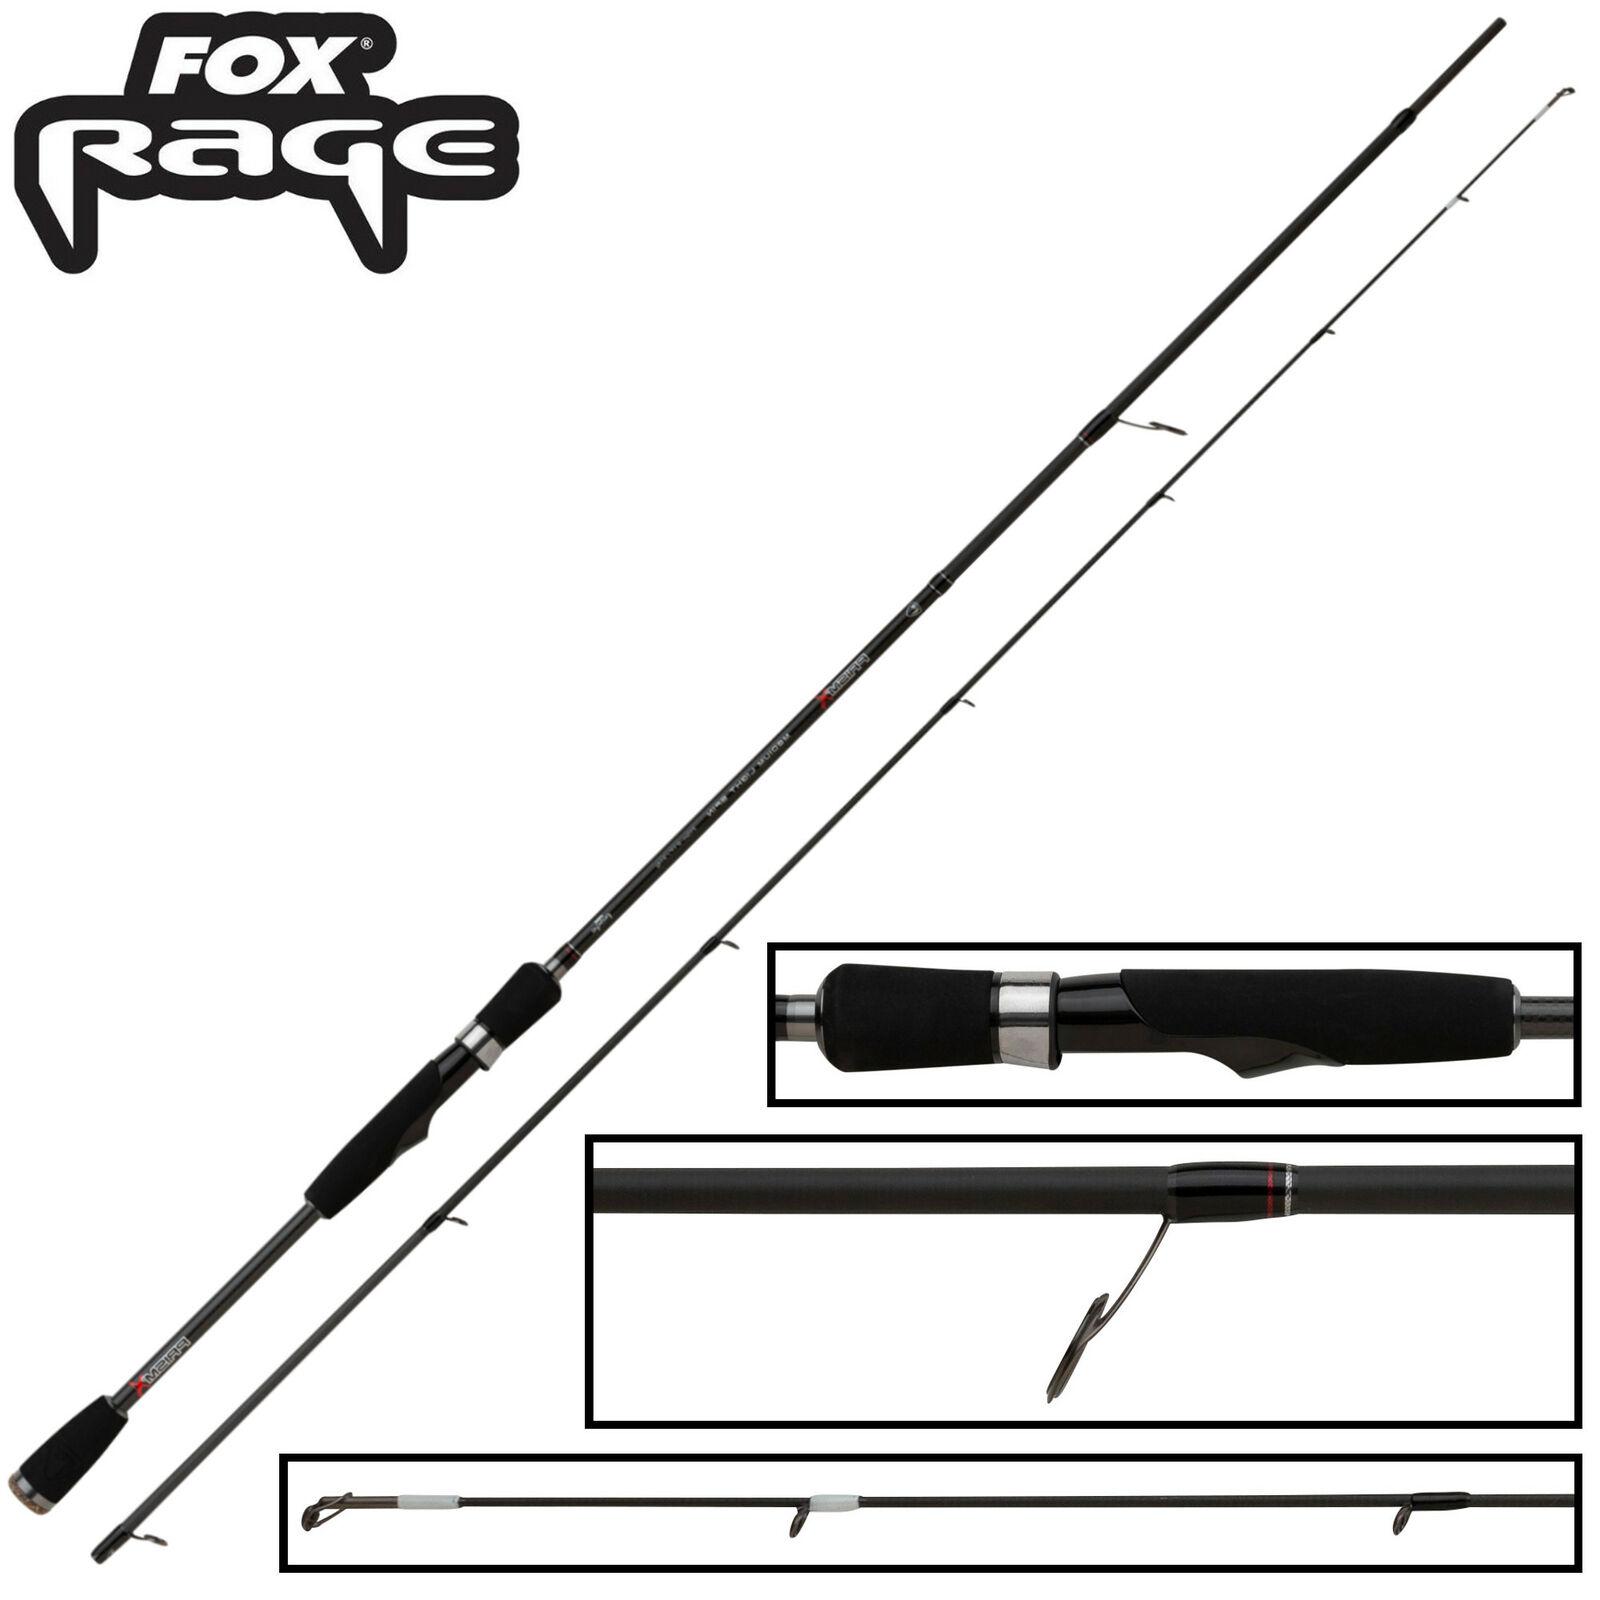 Fox Rage Prism X Medium Light Spin 210cm 3-14g - Spinnrute, Angelrute, Rute